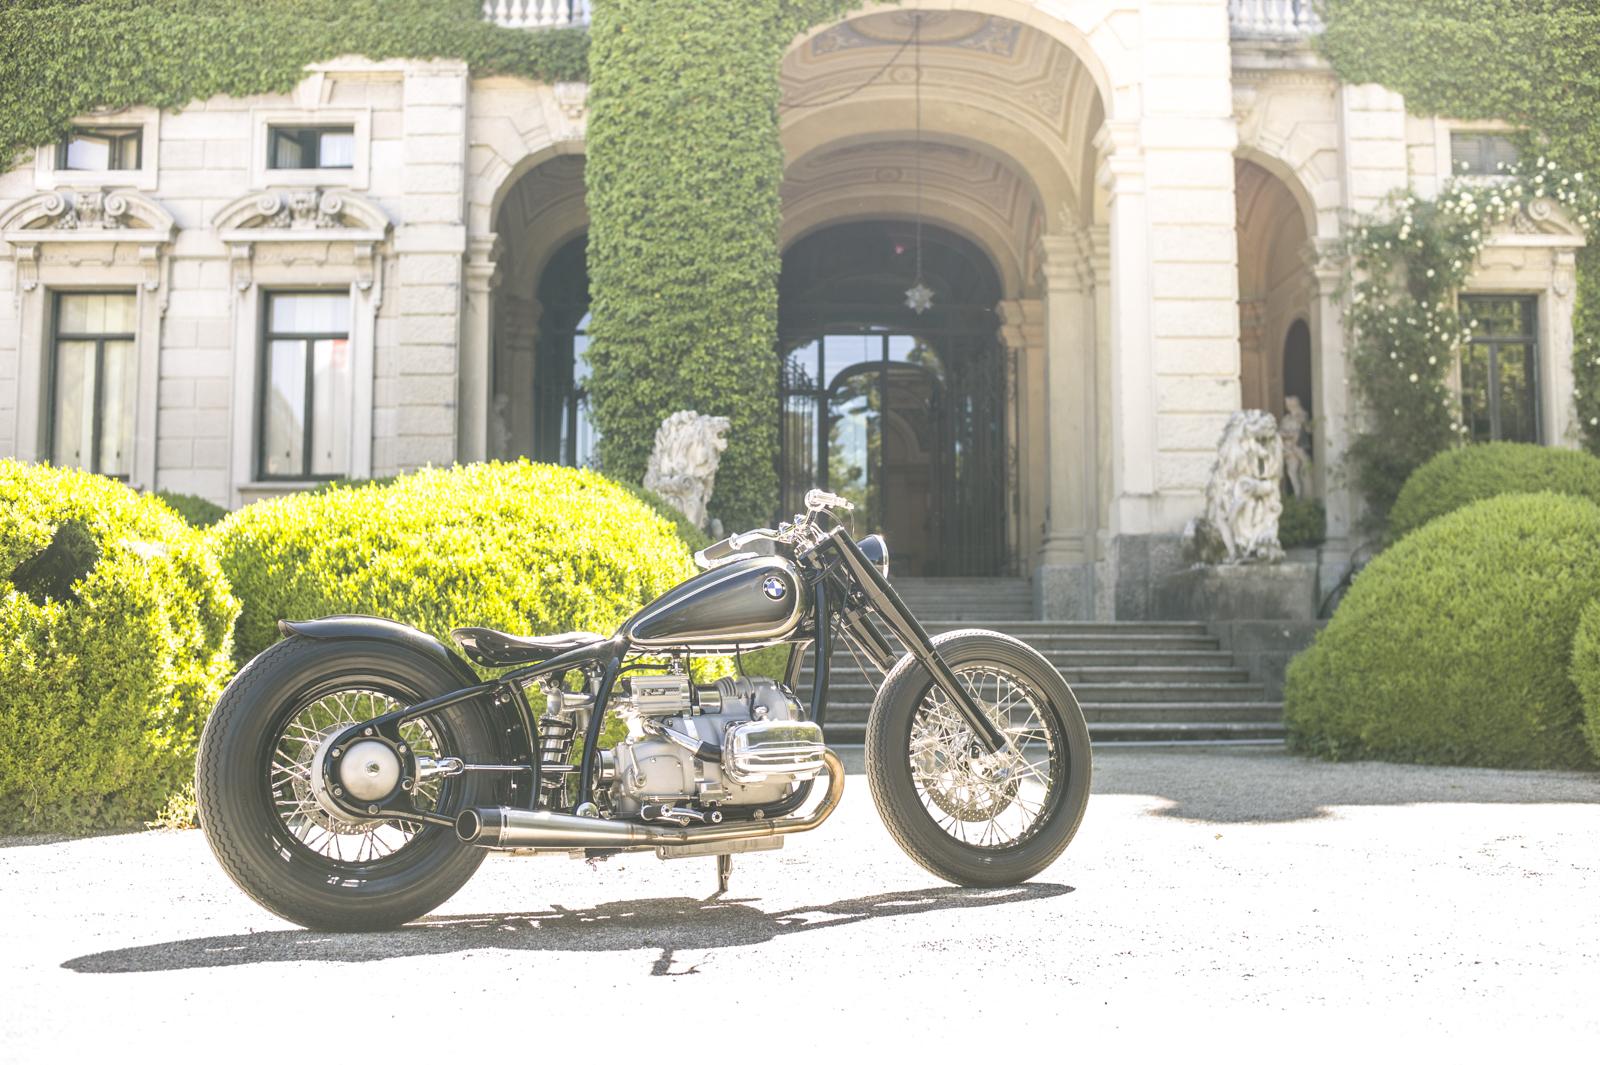 bmw-r5-hommage-bike-villa-deste-6-autonovosti.me-3